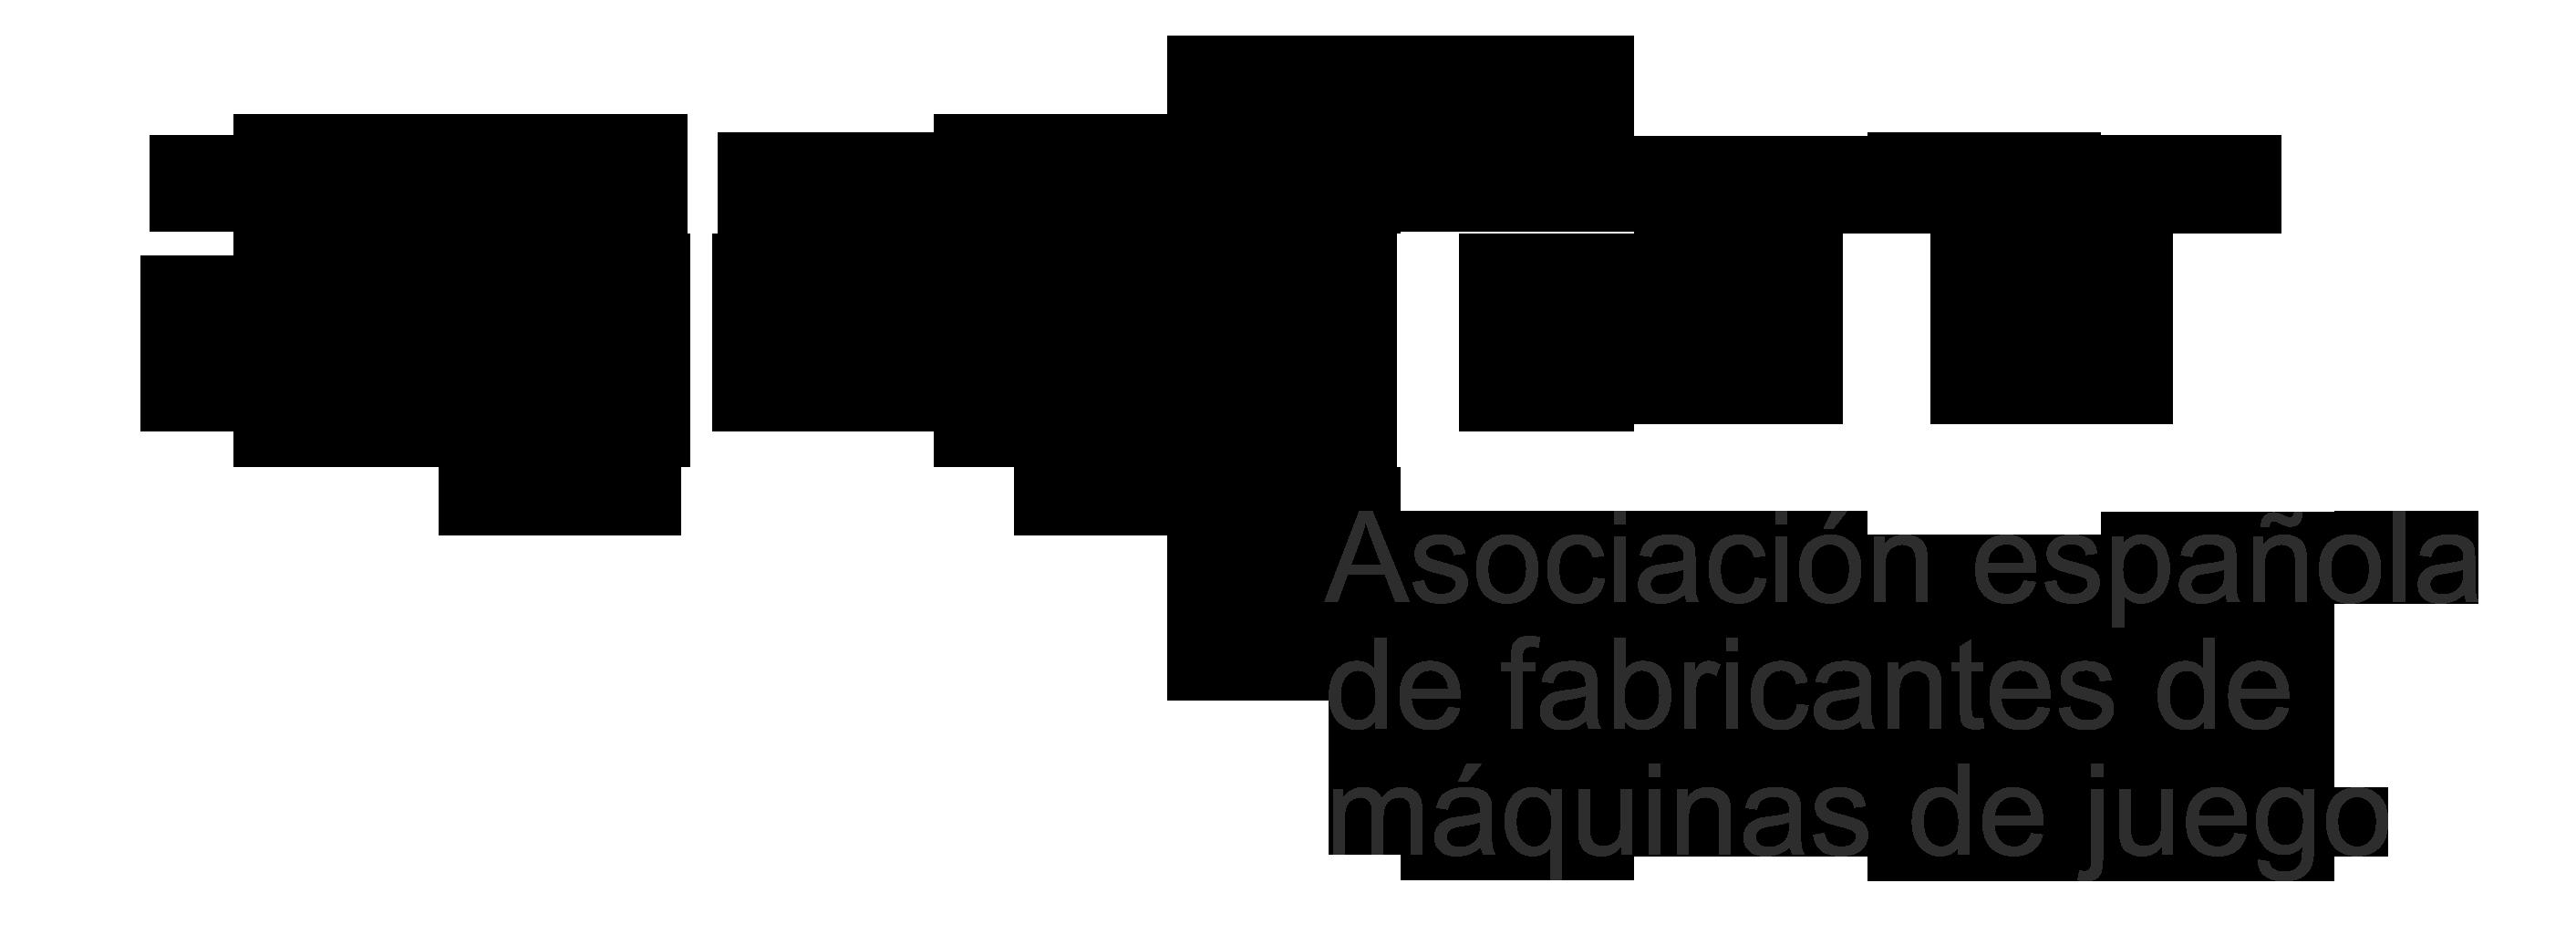 asoc001